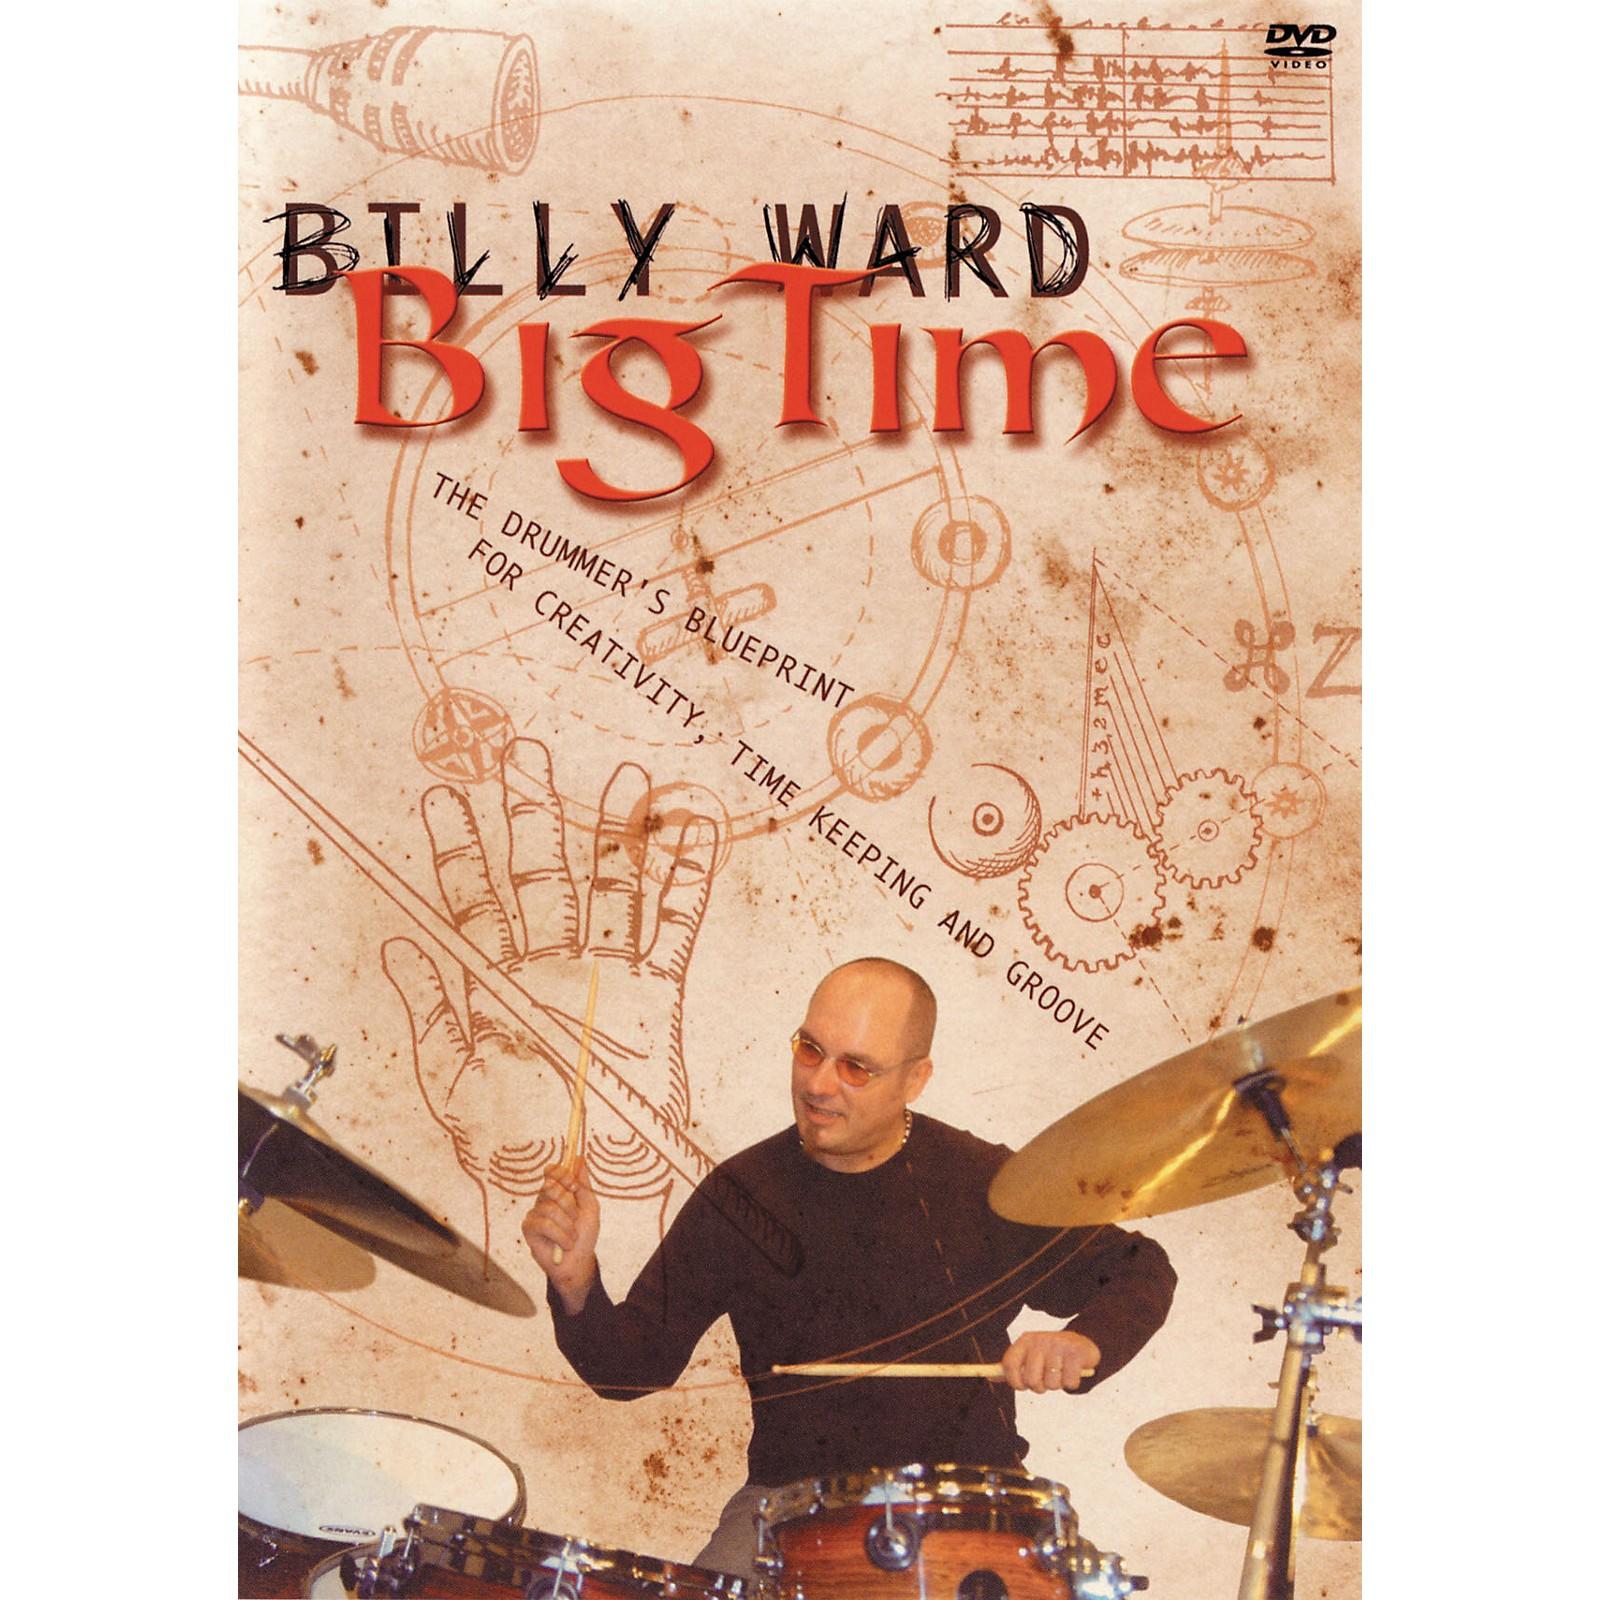 Drum Pike Billy Ward - Big Time DVD